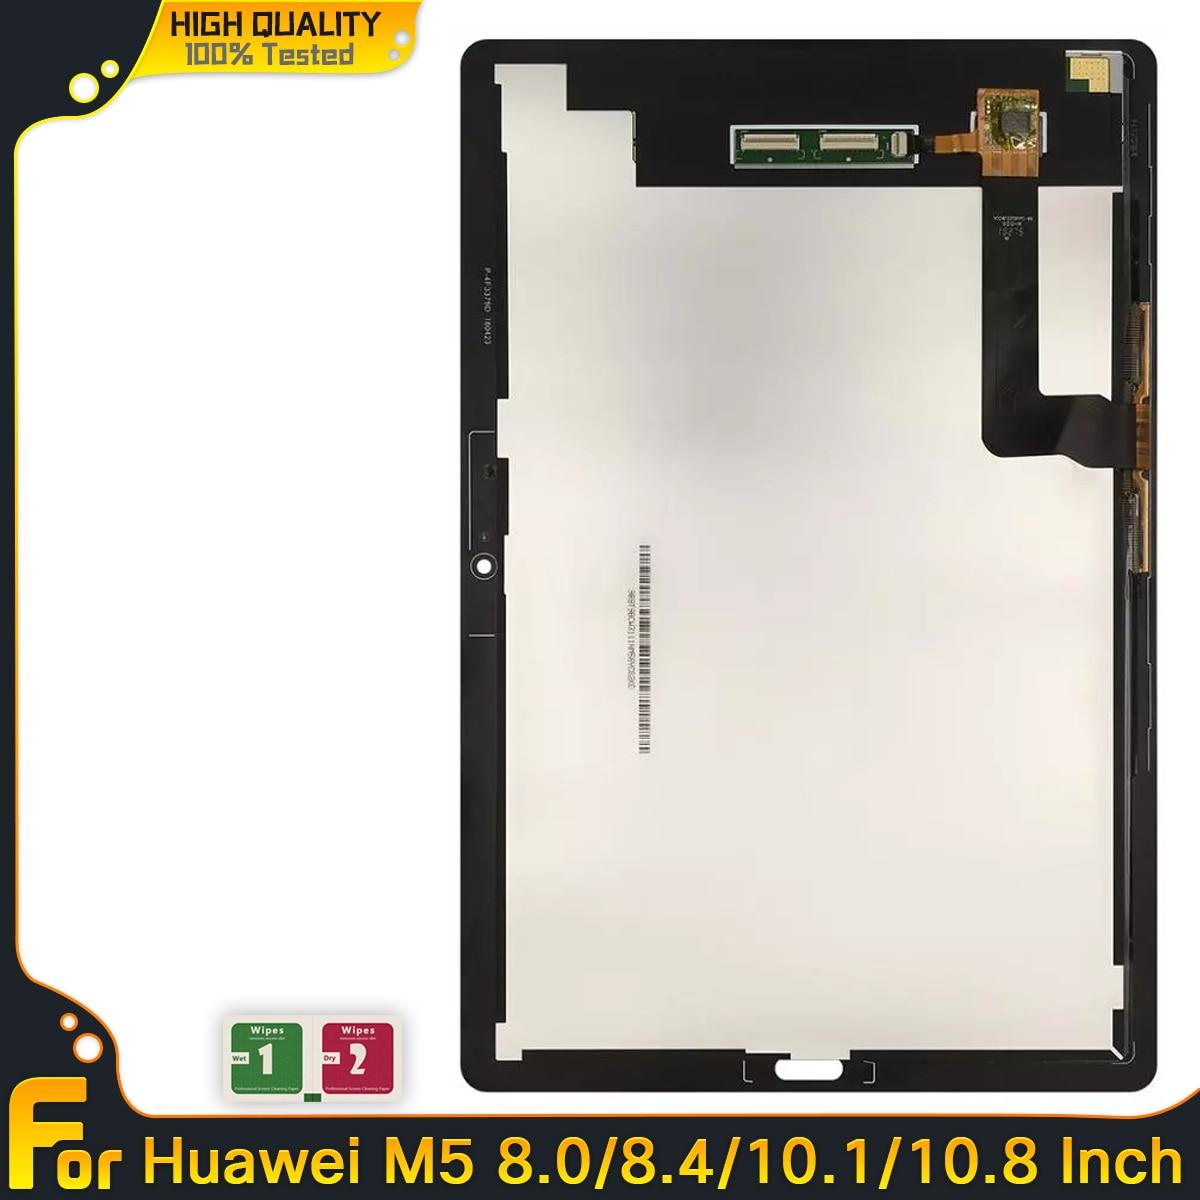 "Repuesto de montaje de Sensor de M5 para Huawei MediaPad Digitalizador de pantalla táctil, Panel de pantalla LCD de 10,8 pulgadas, 8,4 "", 10,0"", 10,8"""